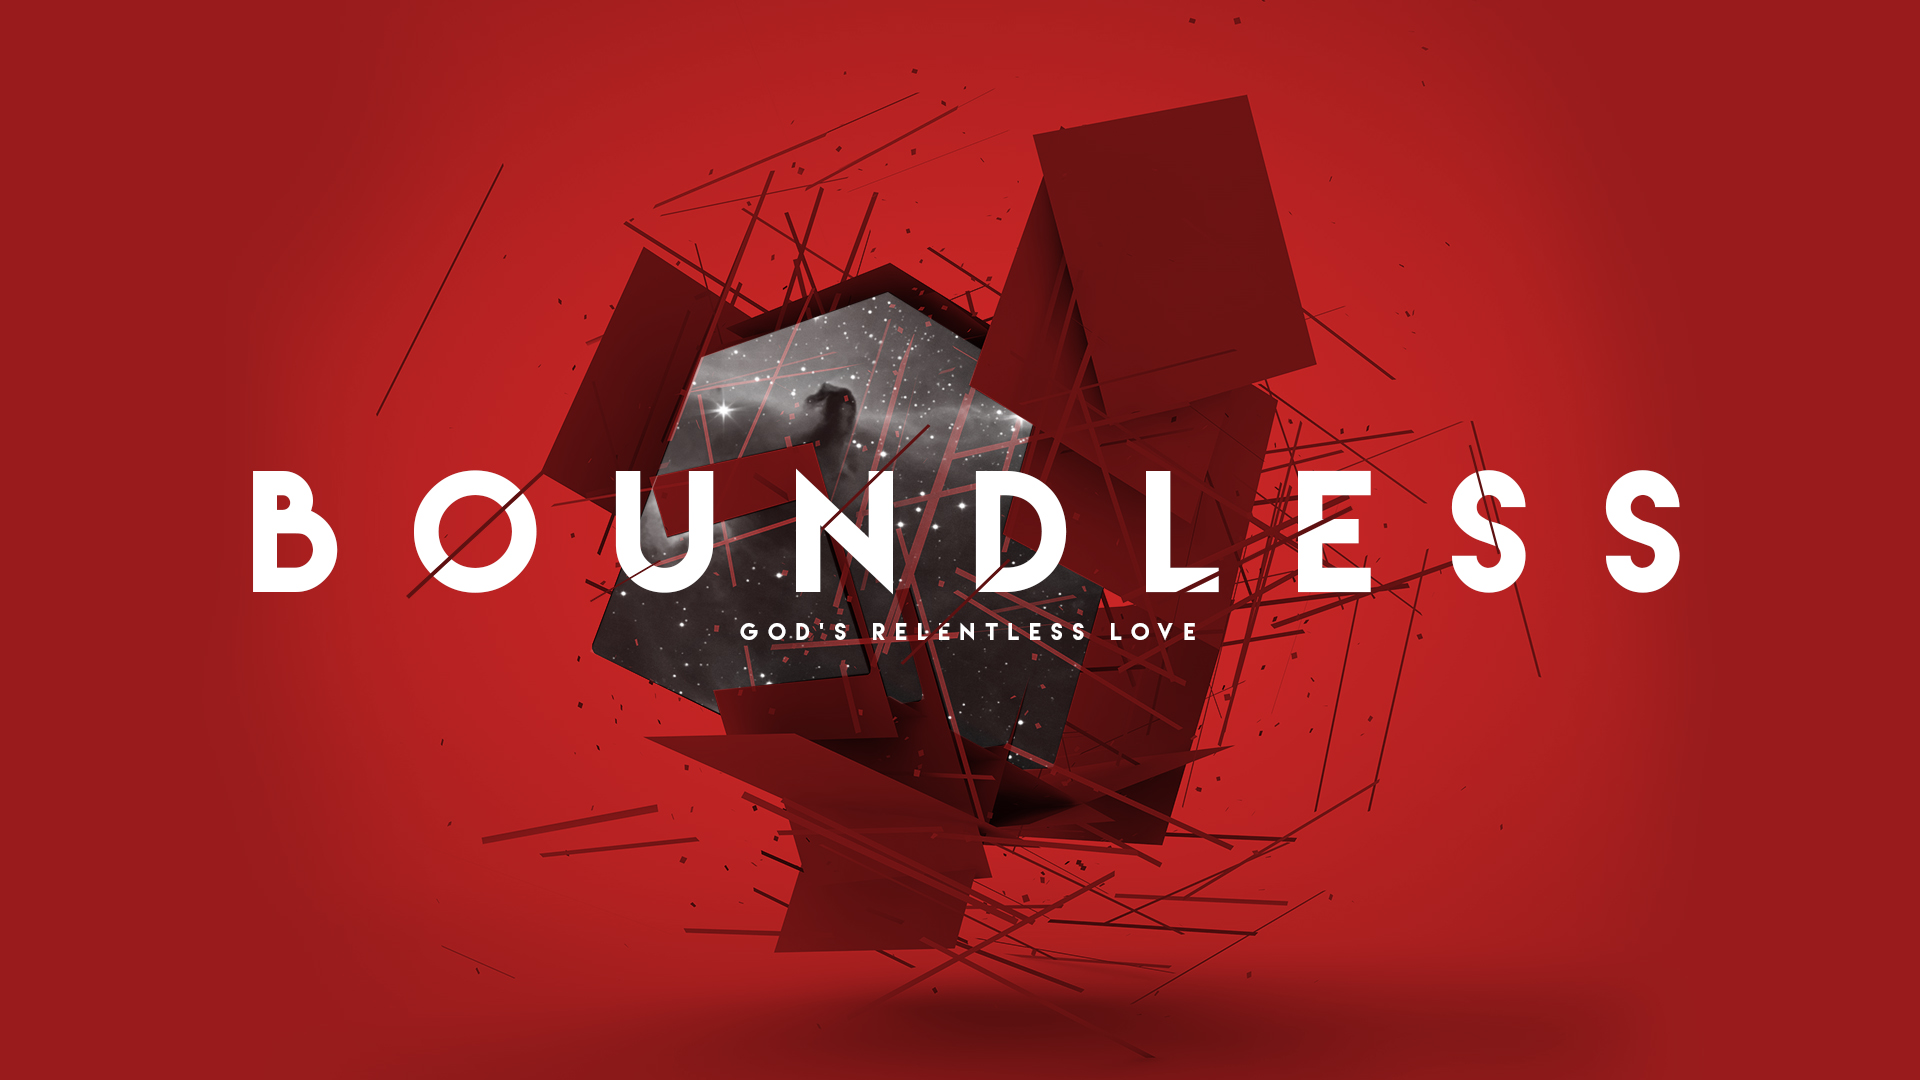 Boundless_title slide.jpg